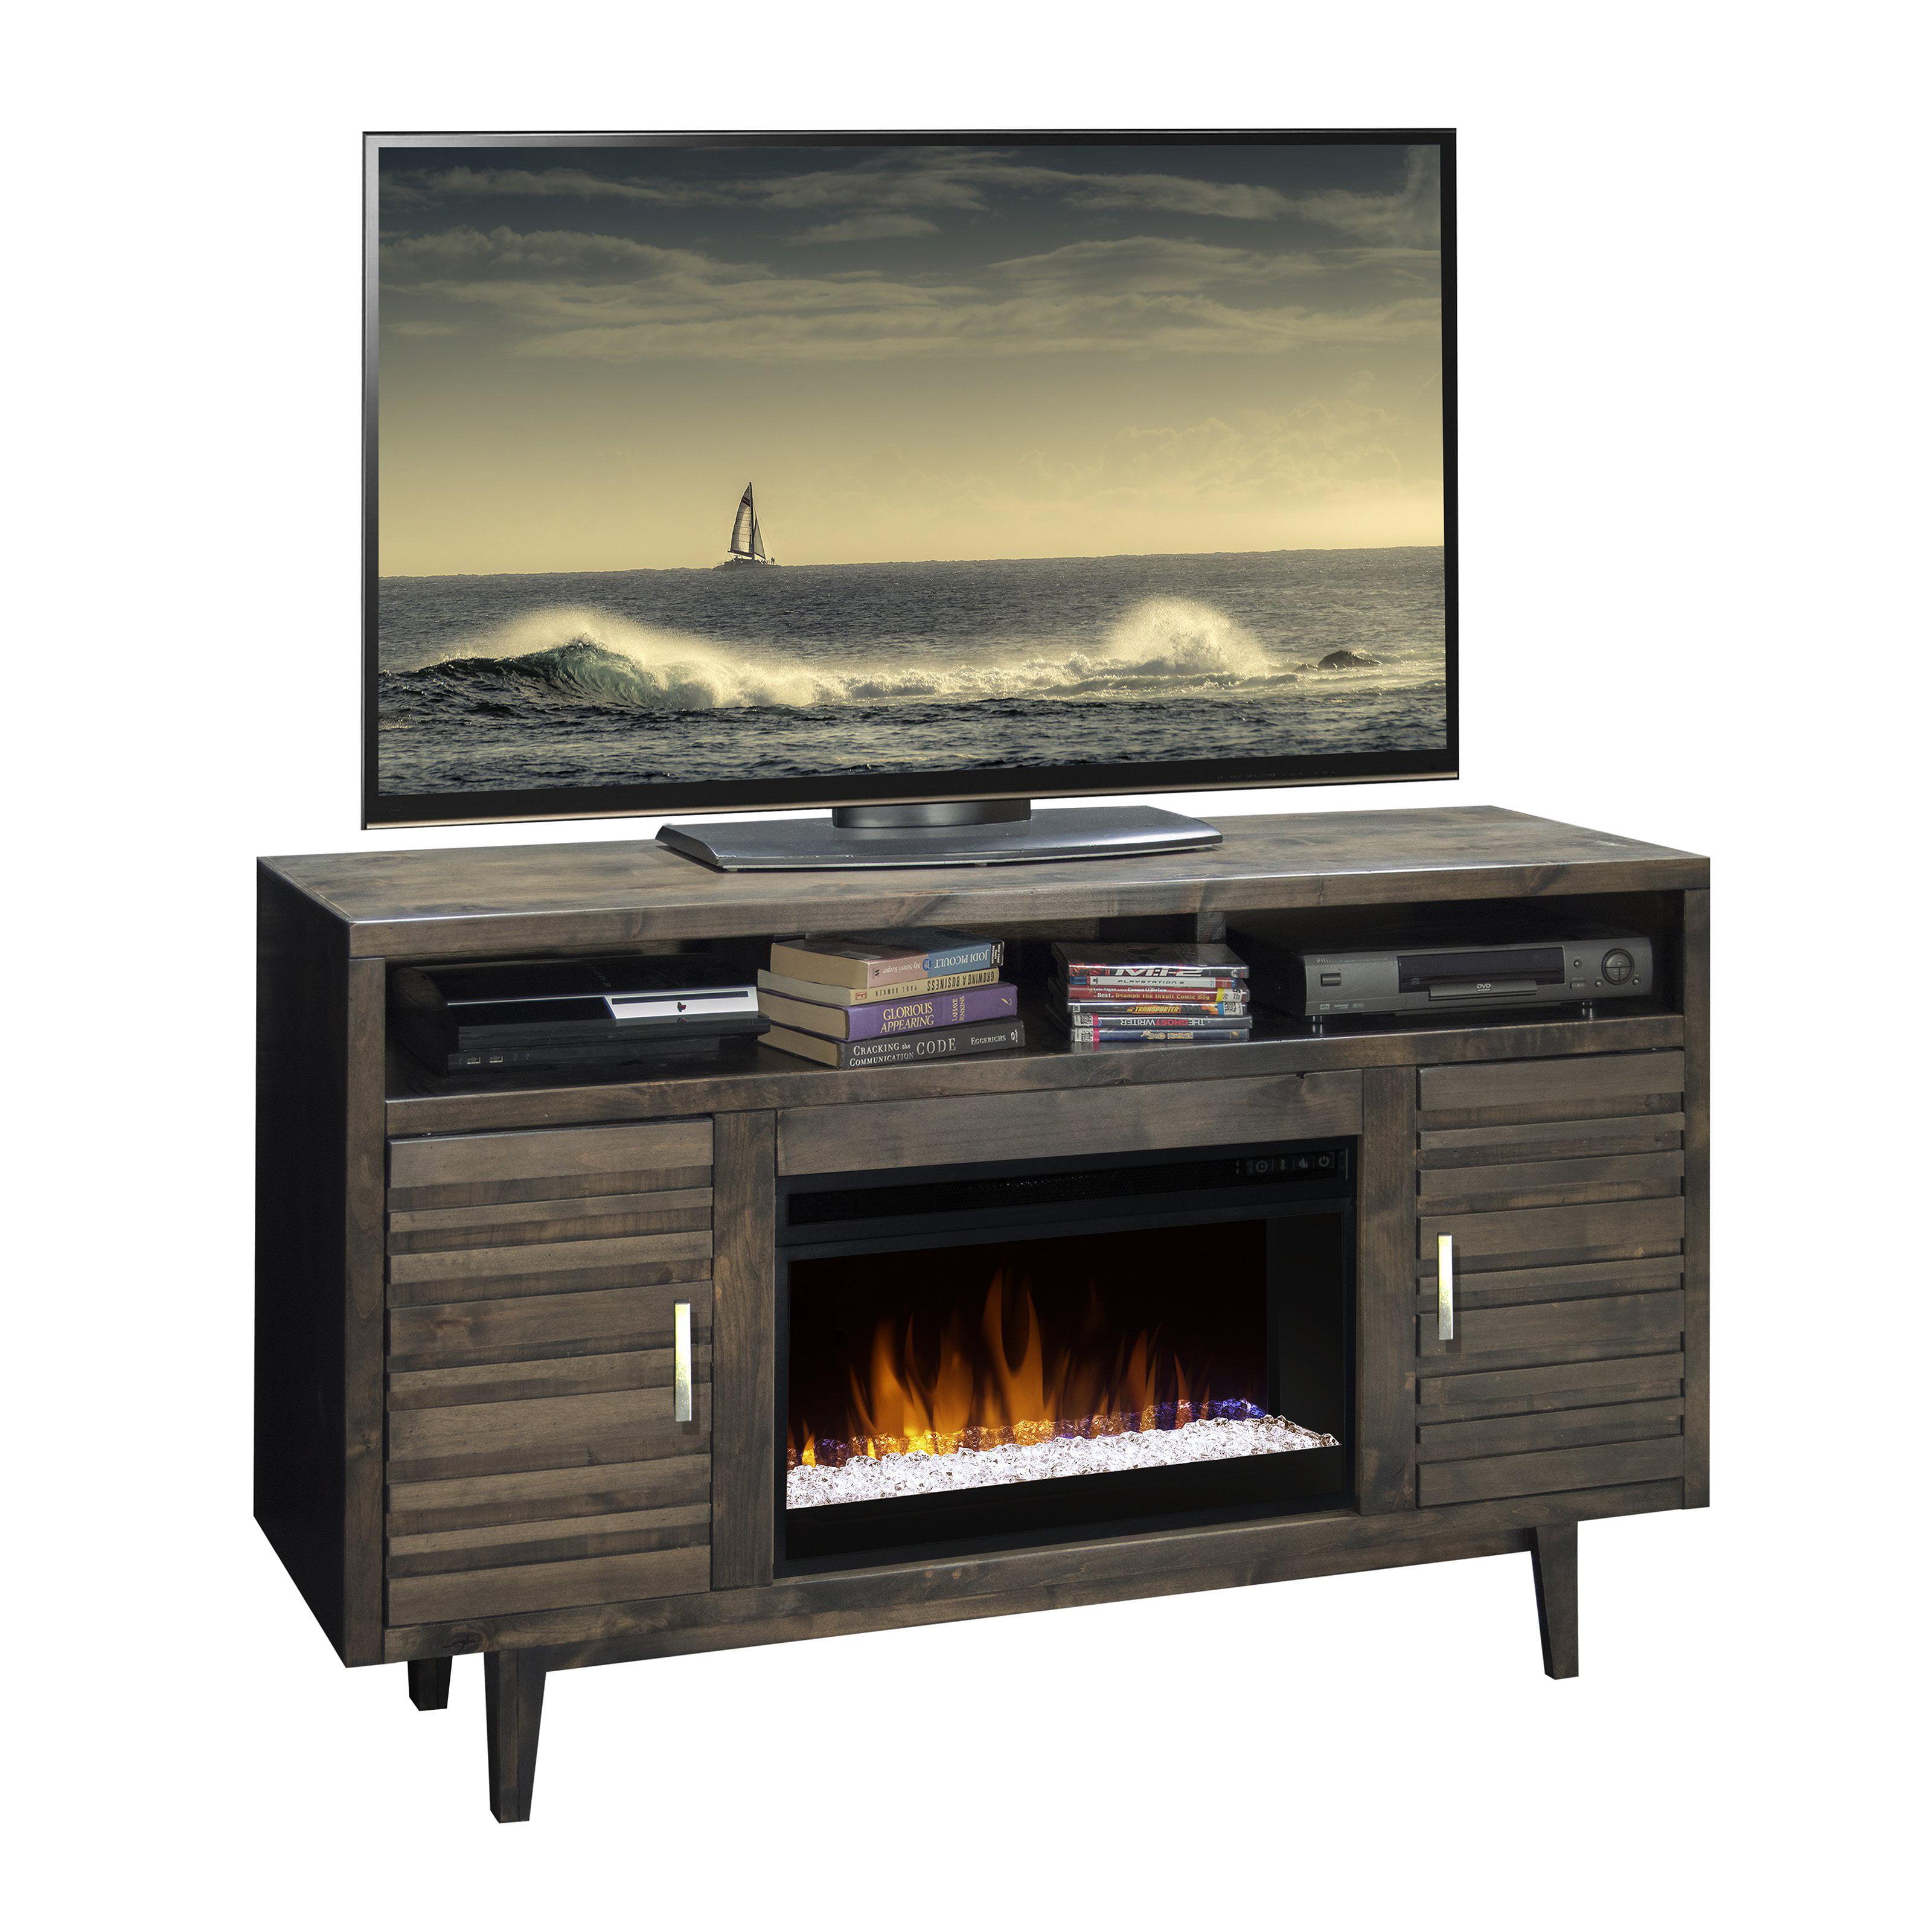 Legends Furniture Avondale 61 in. Electric Media Fireplace